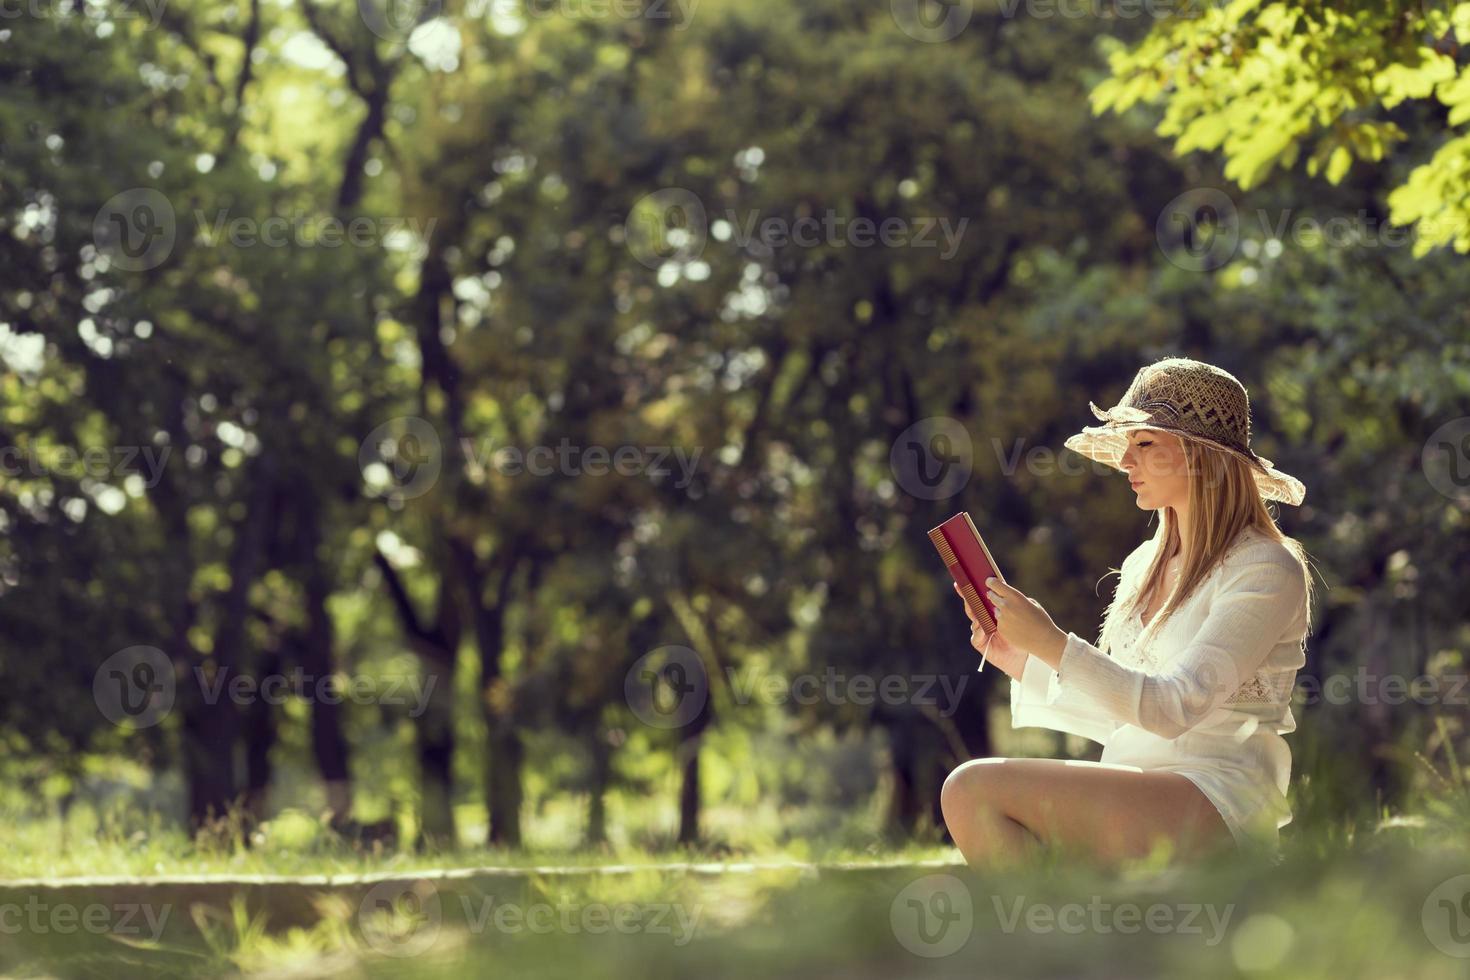 leggere un libro foto